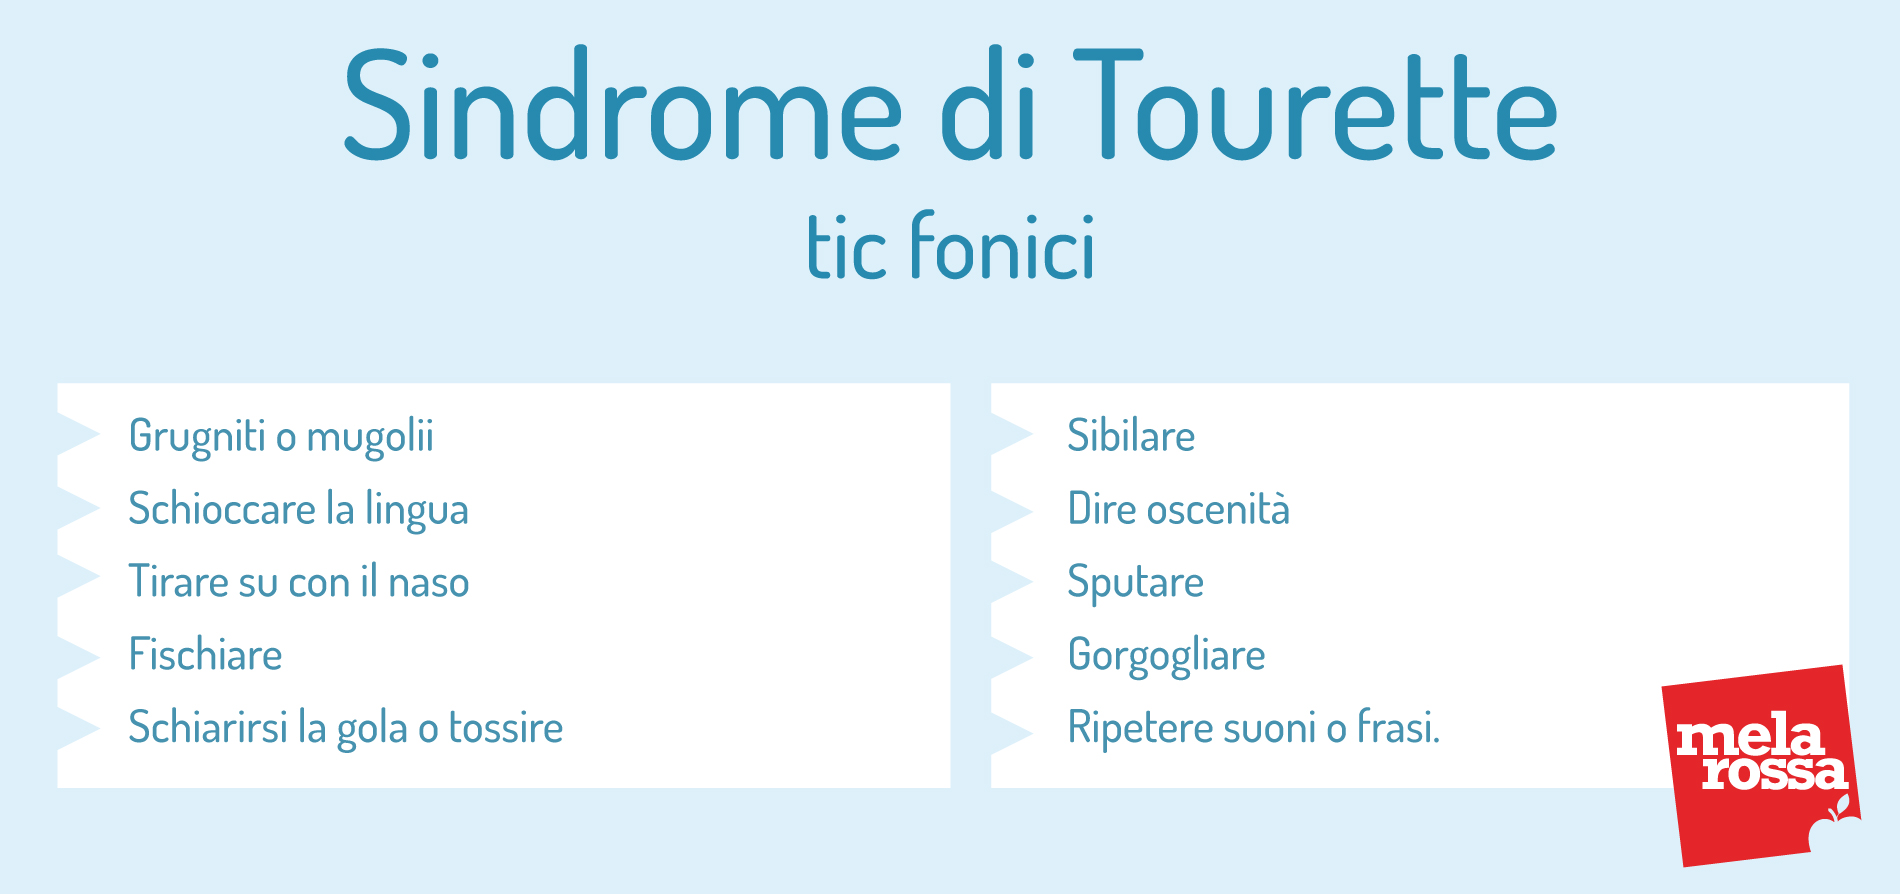 Sindrome di Tourette: tic fonici